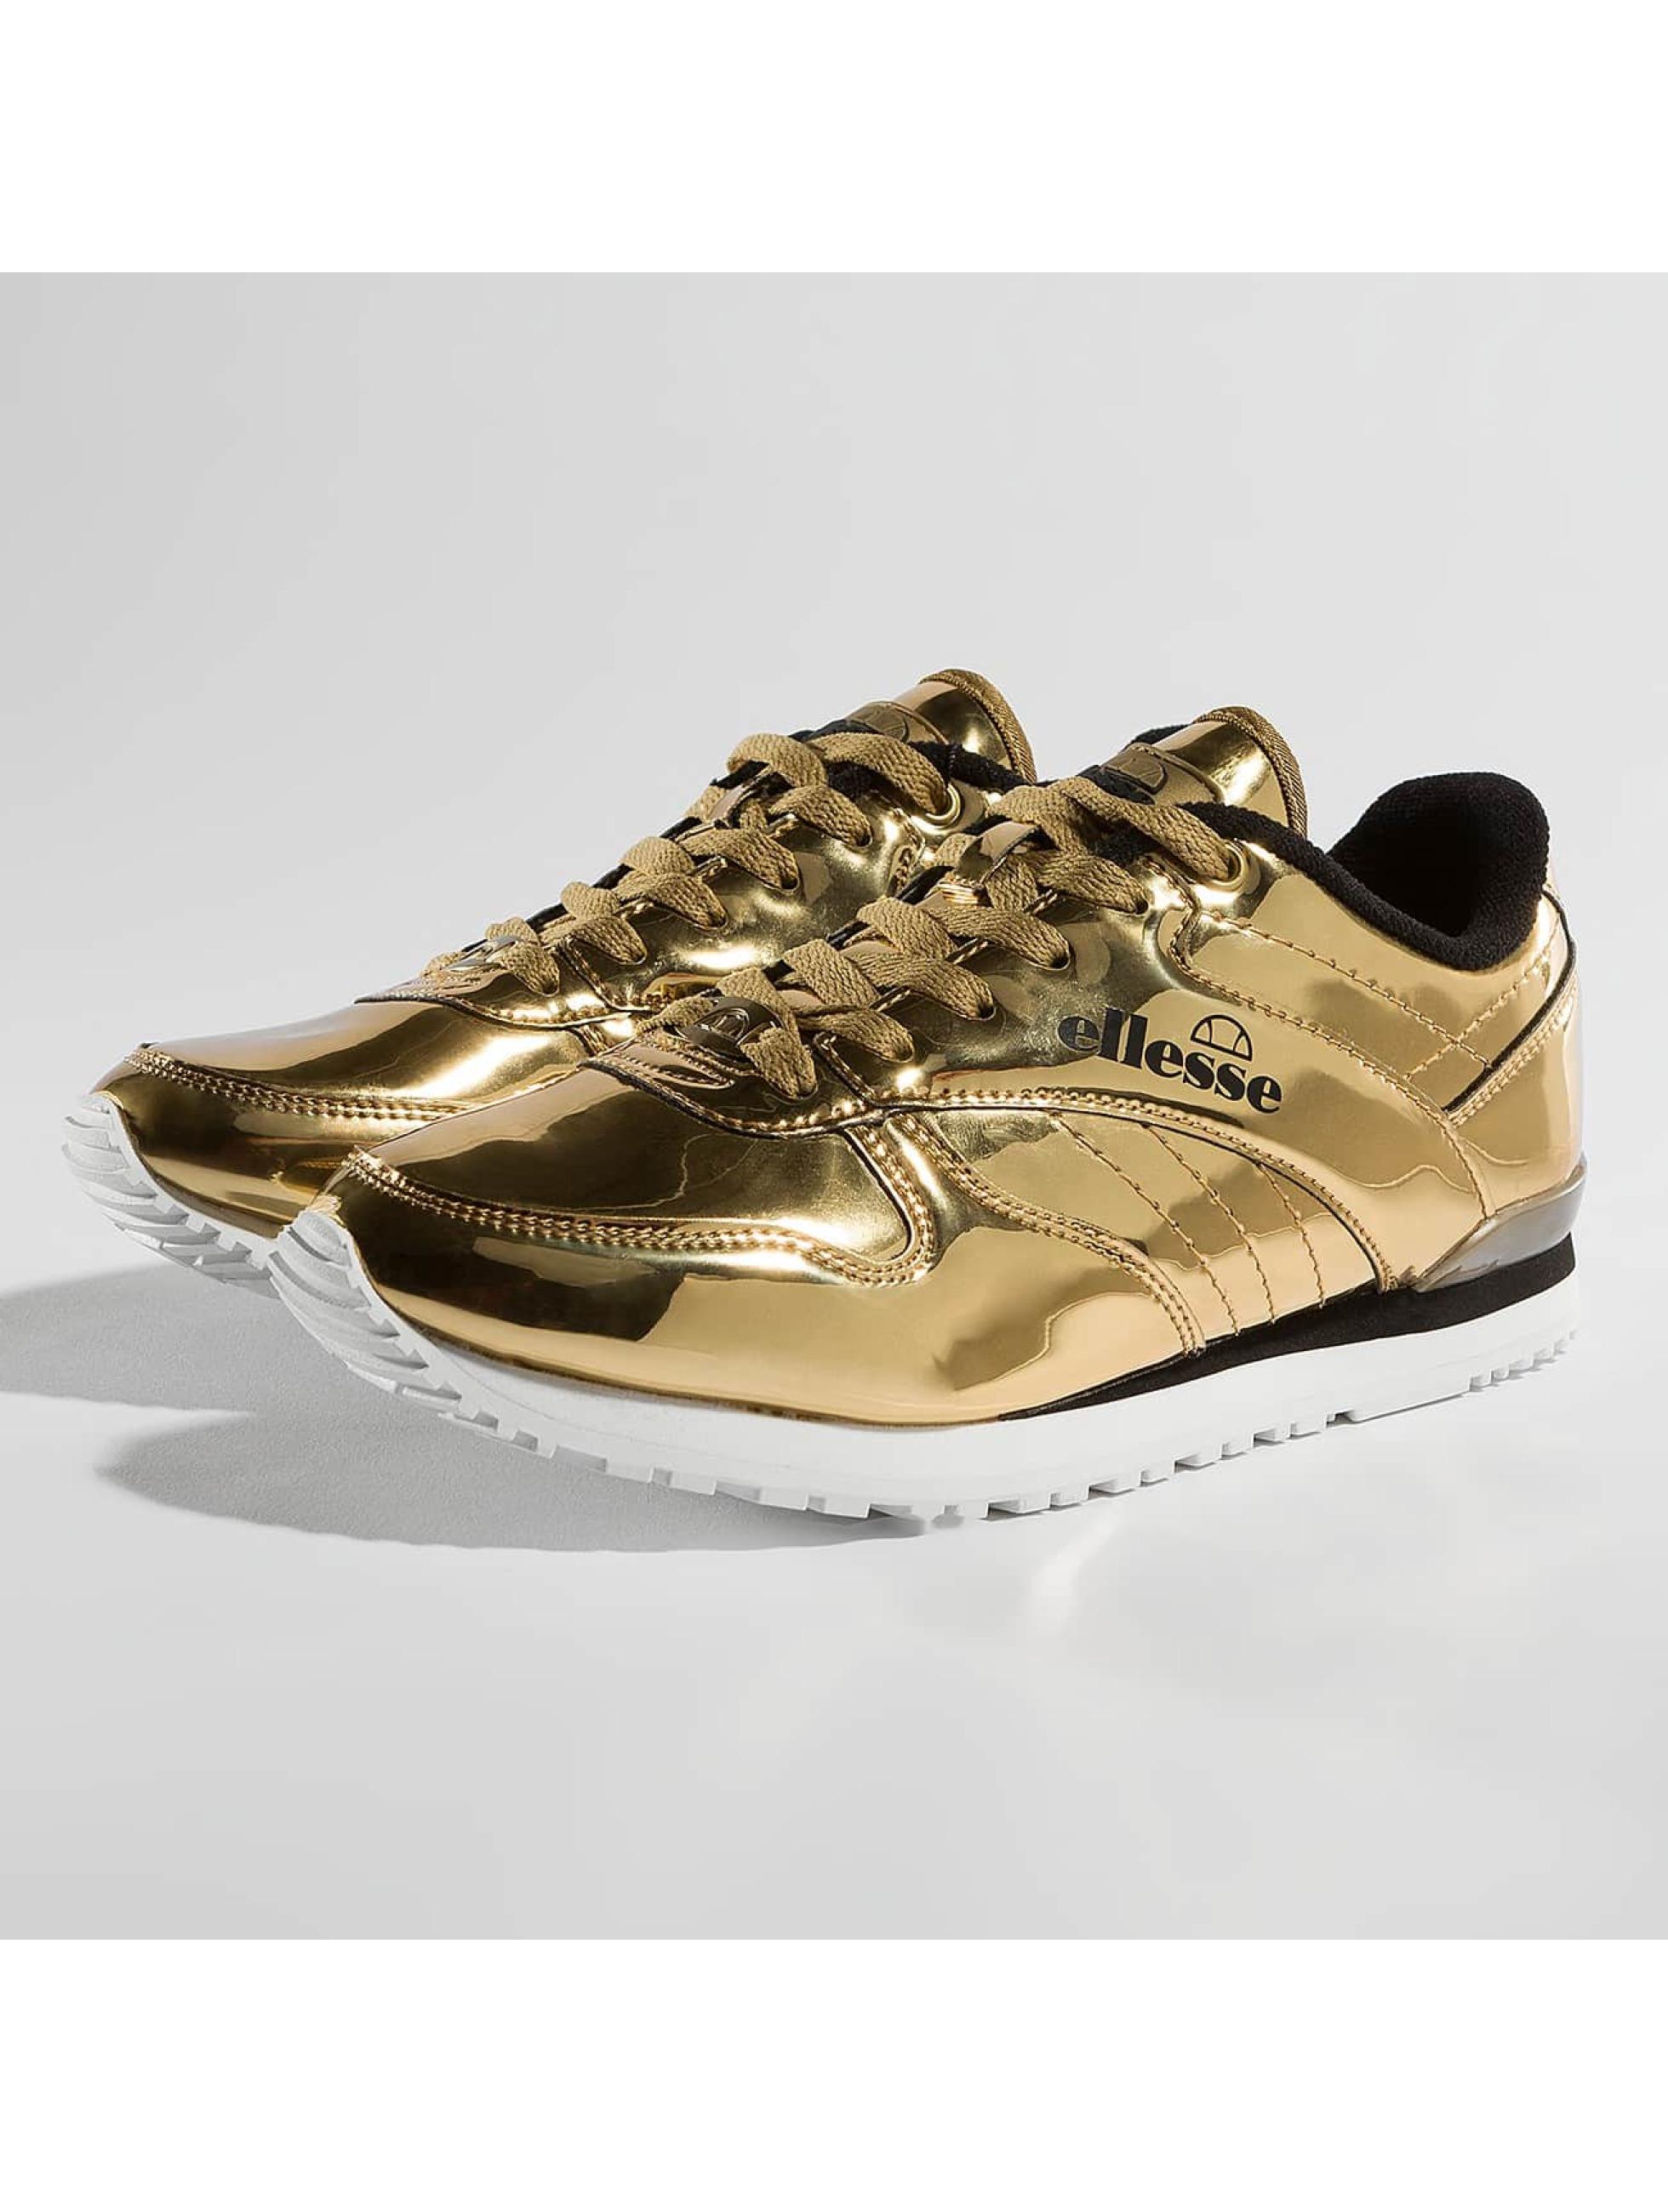 Ellesse Sneakers Heritage City Runner Metallic Runner gold